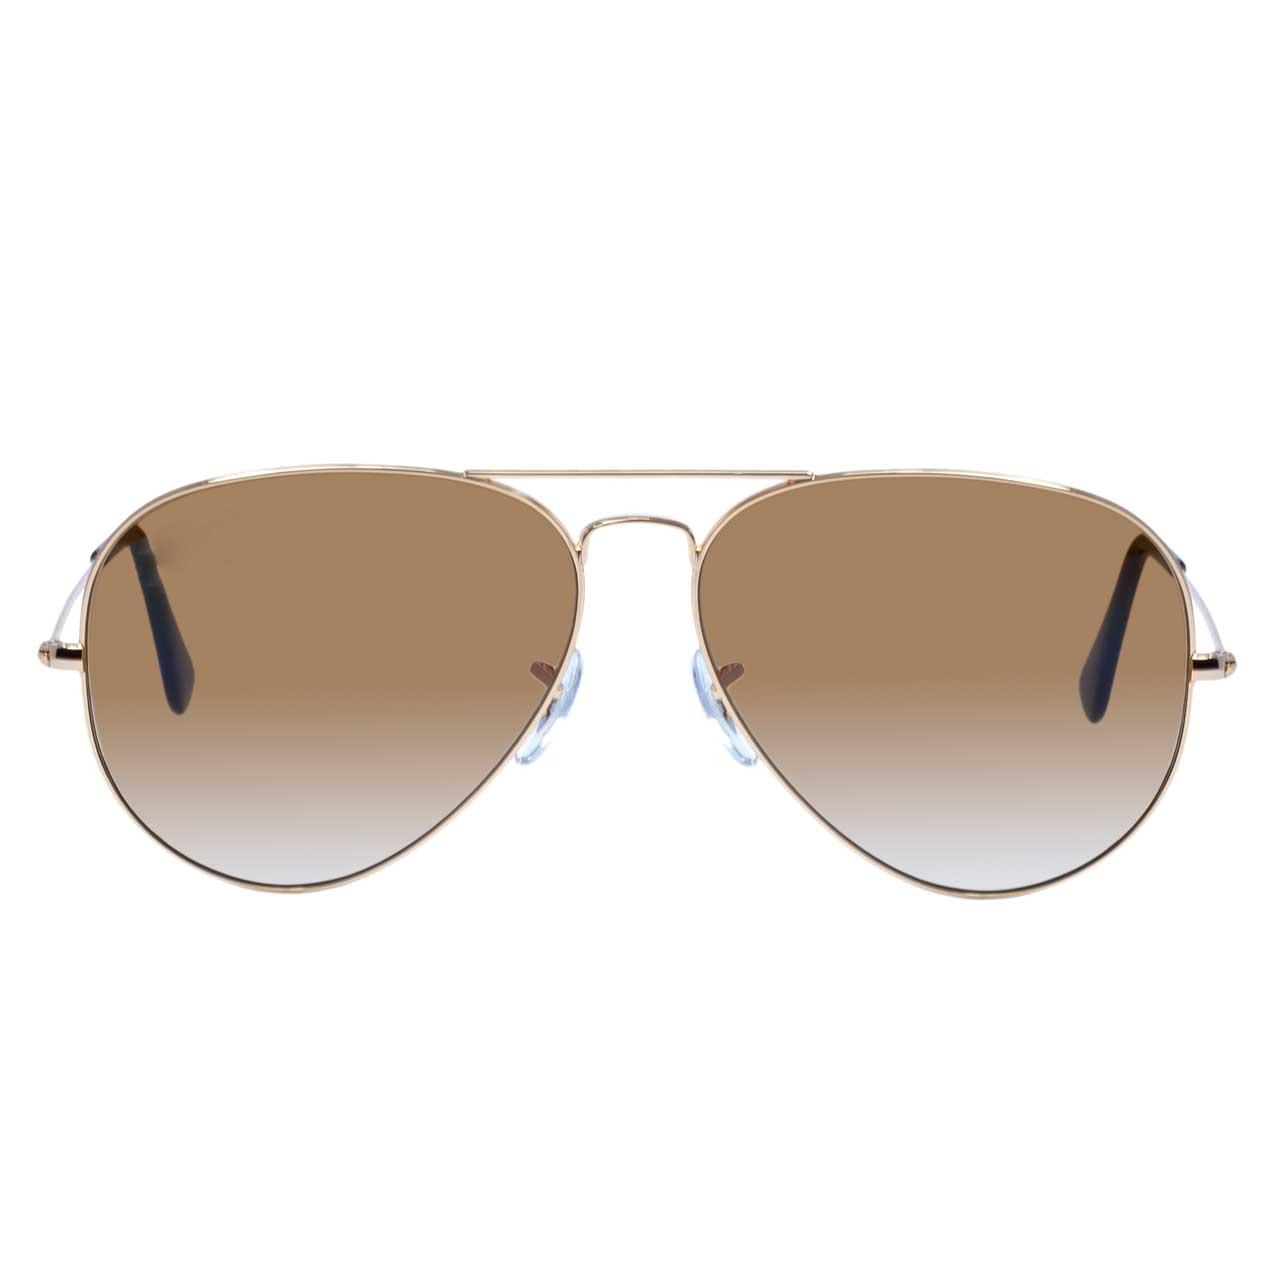 عینک آفتابی  مدل RB 3025 - 001/51